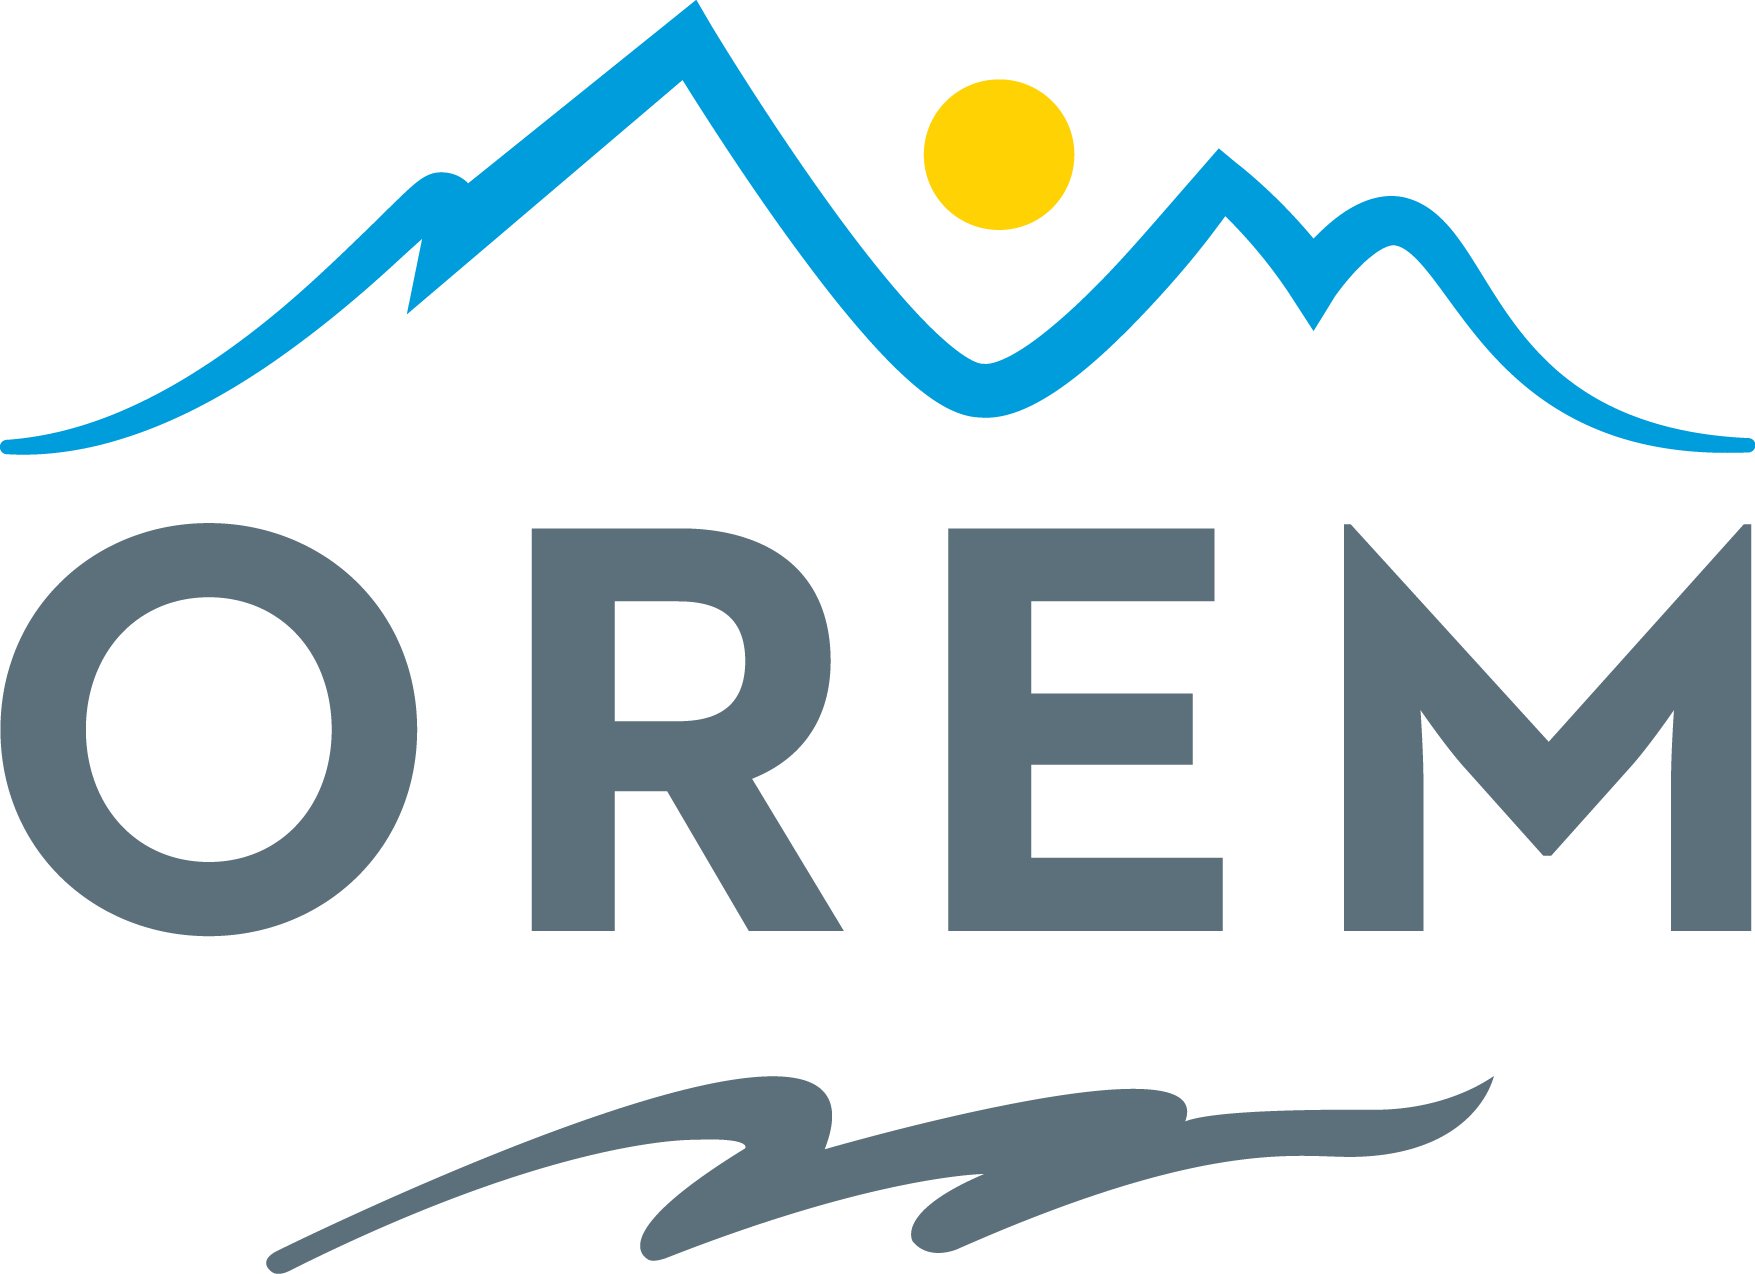 City of Orem